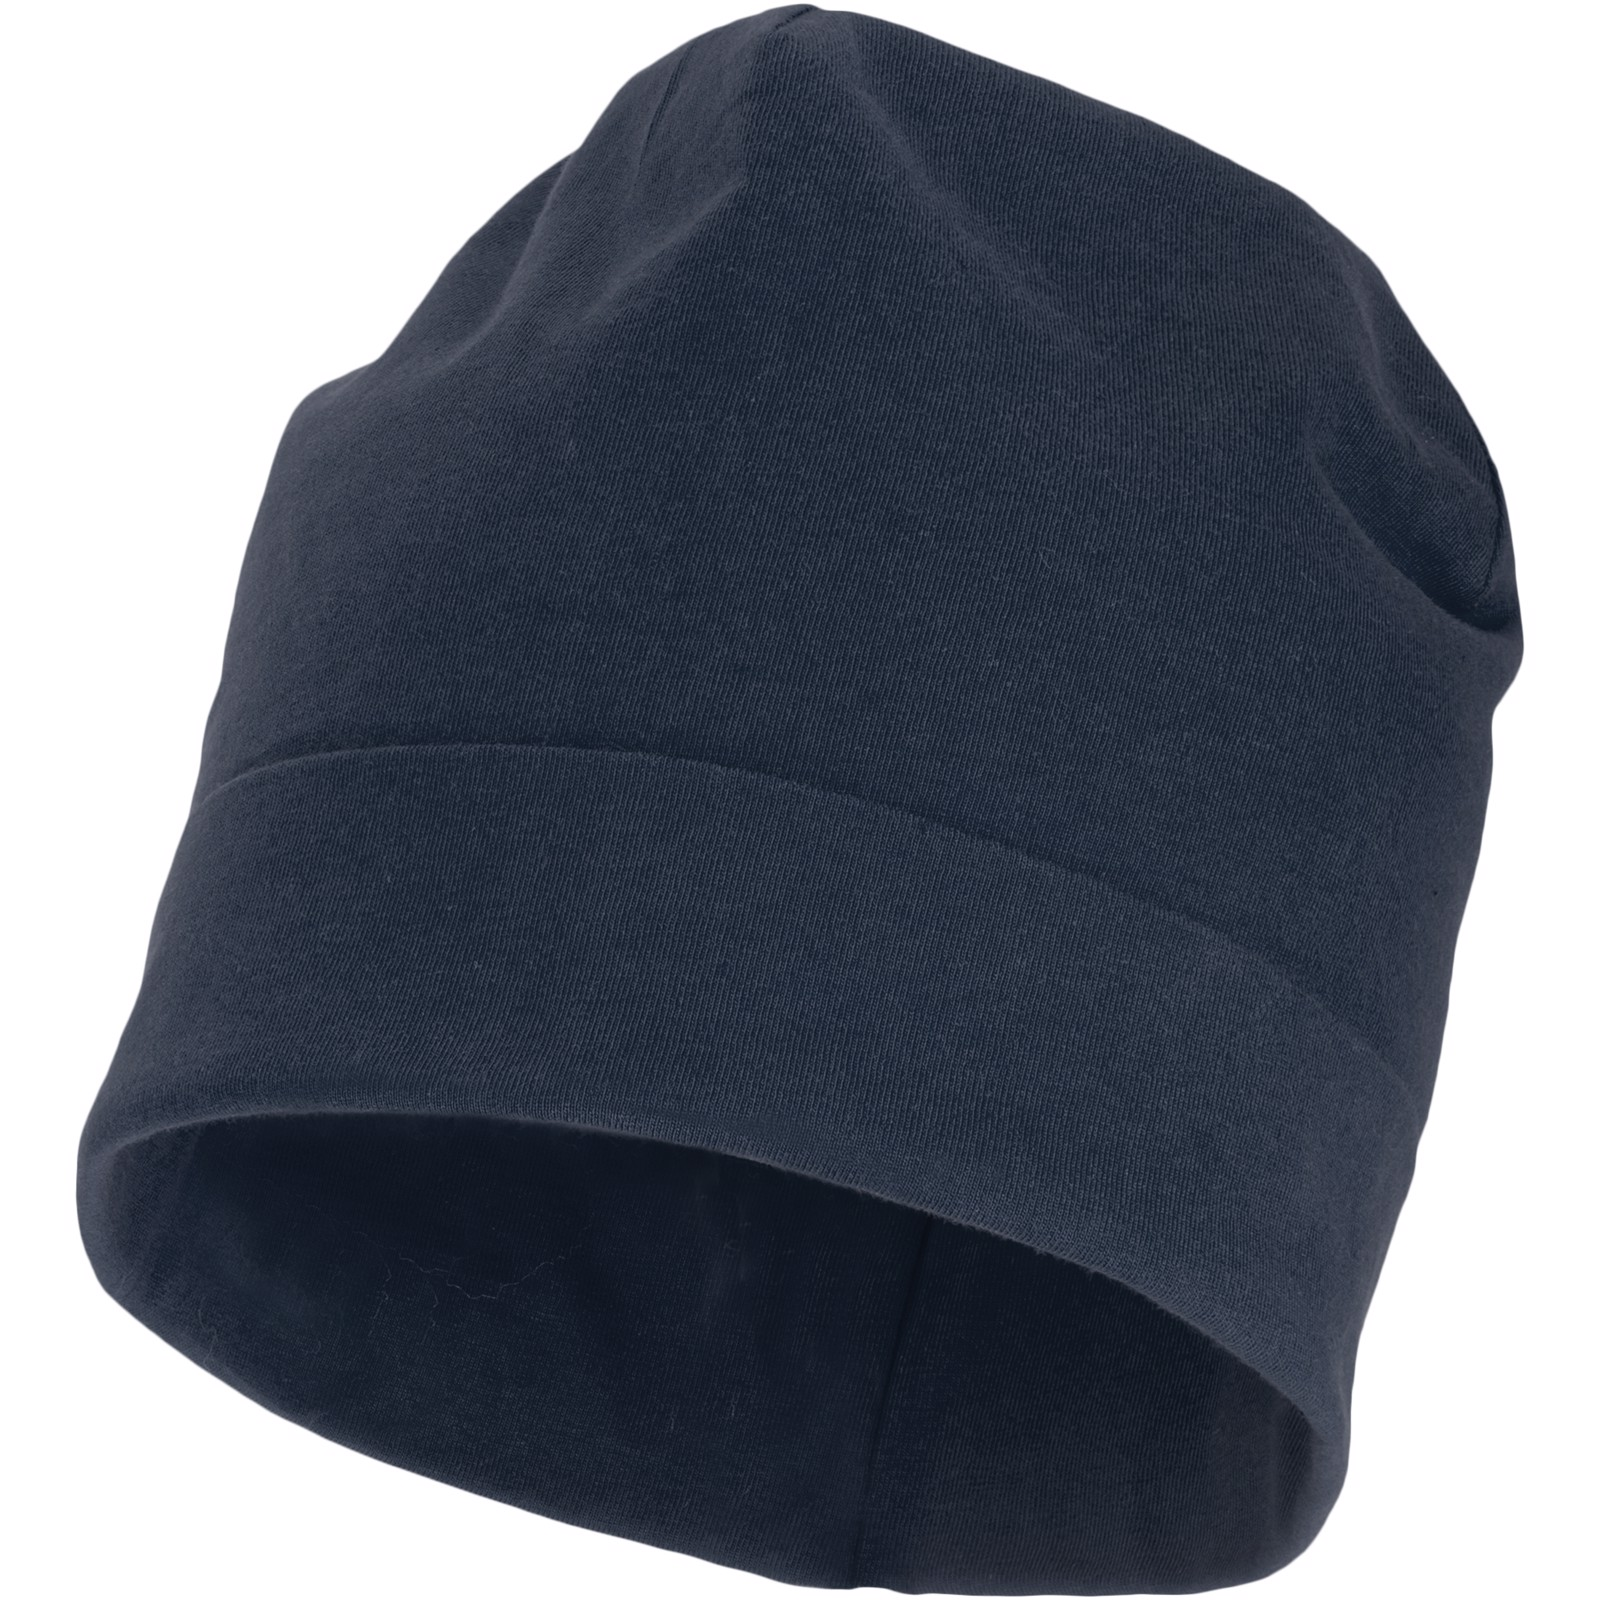 Tempo jersey knit togue - Navy